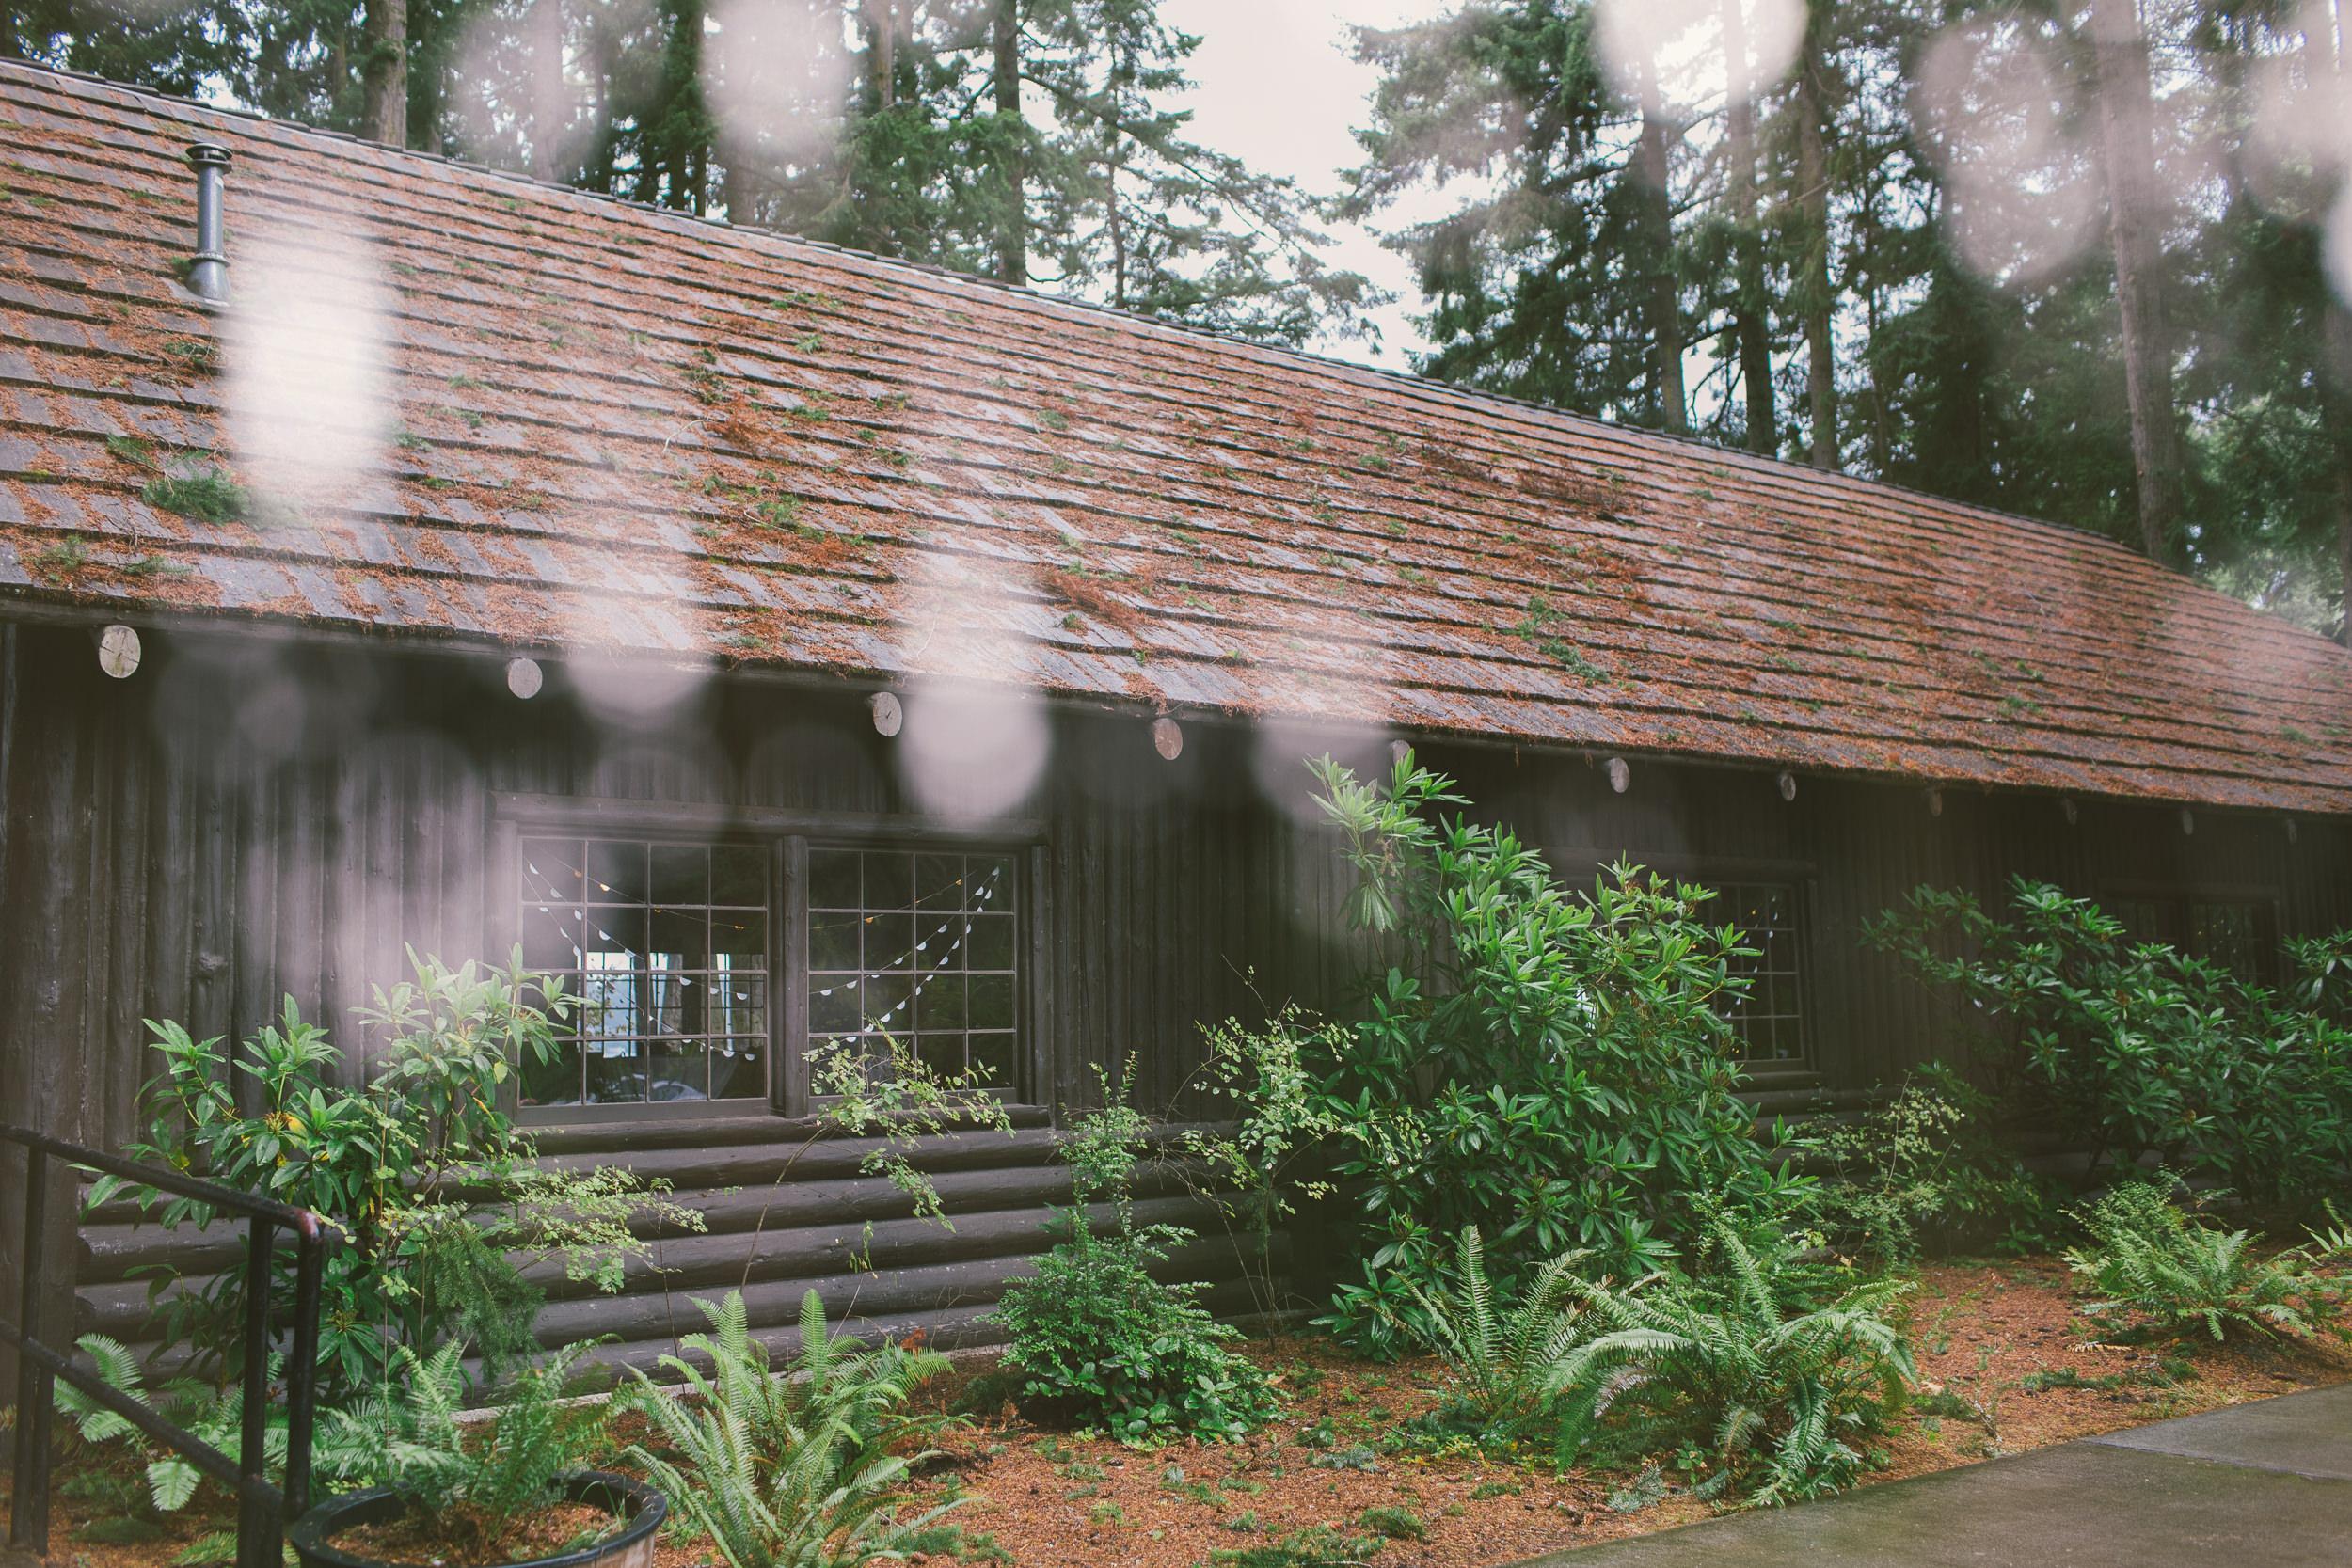 kitsap memorial state park log hall